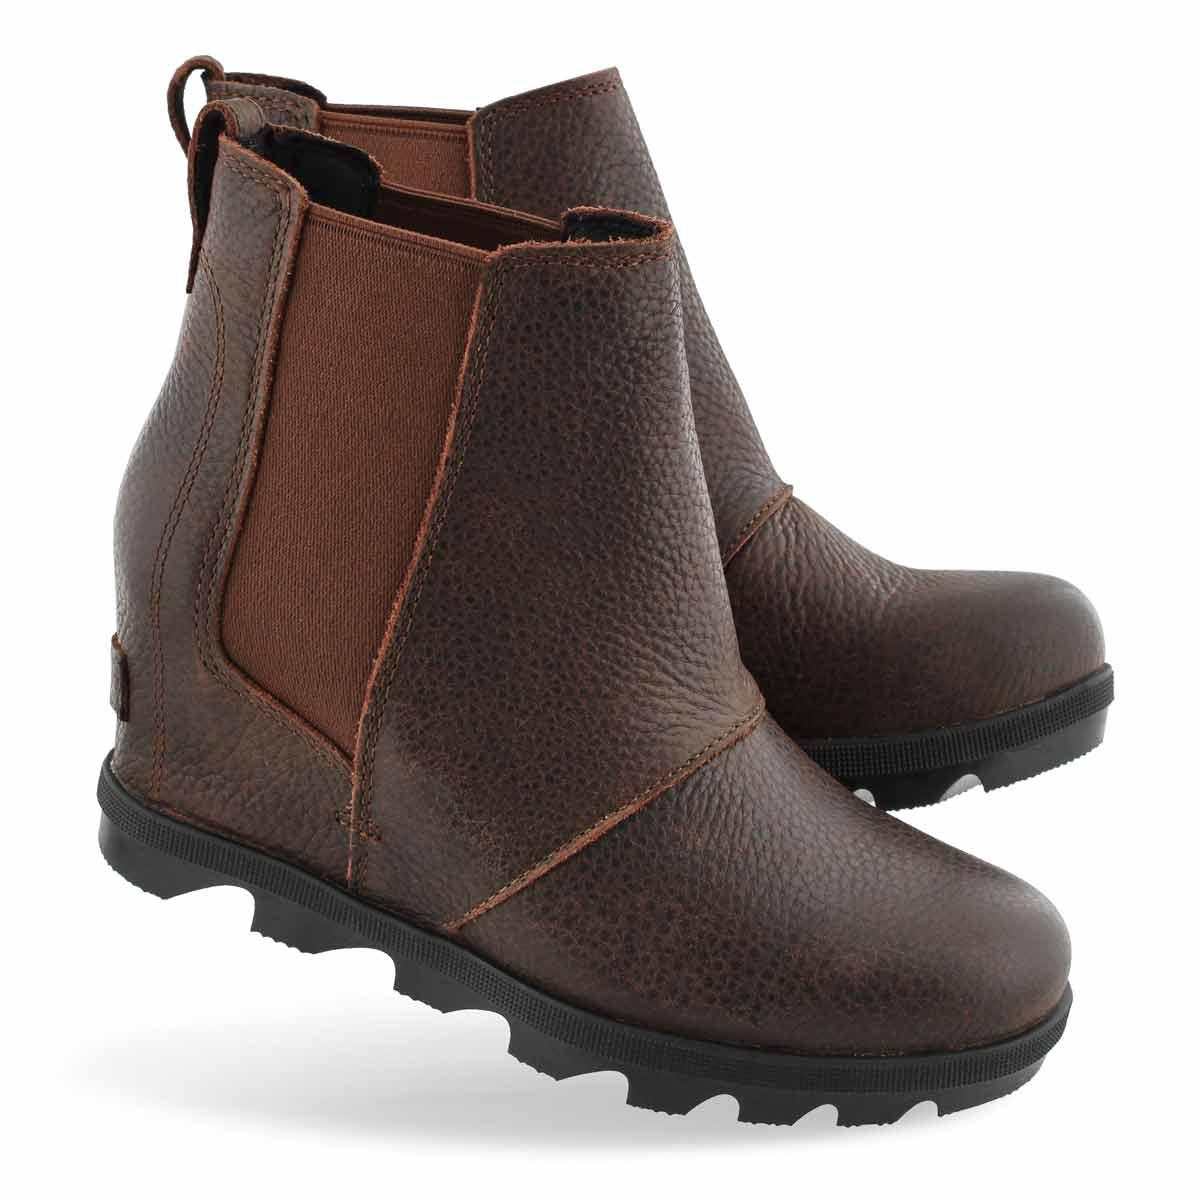 Lds JOA Wedge II Chelsea burro wp boot